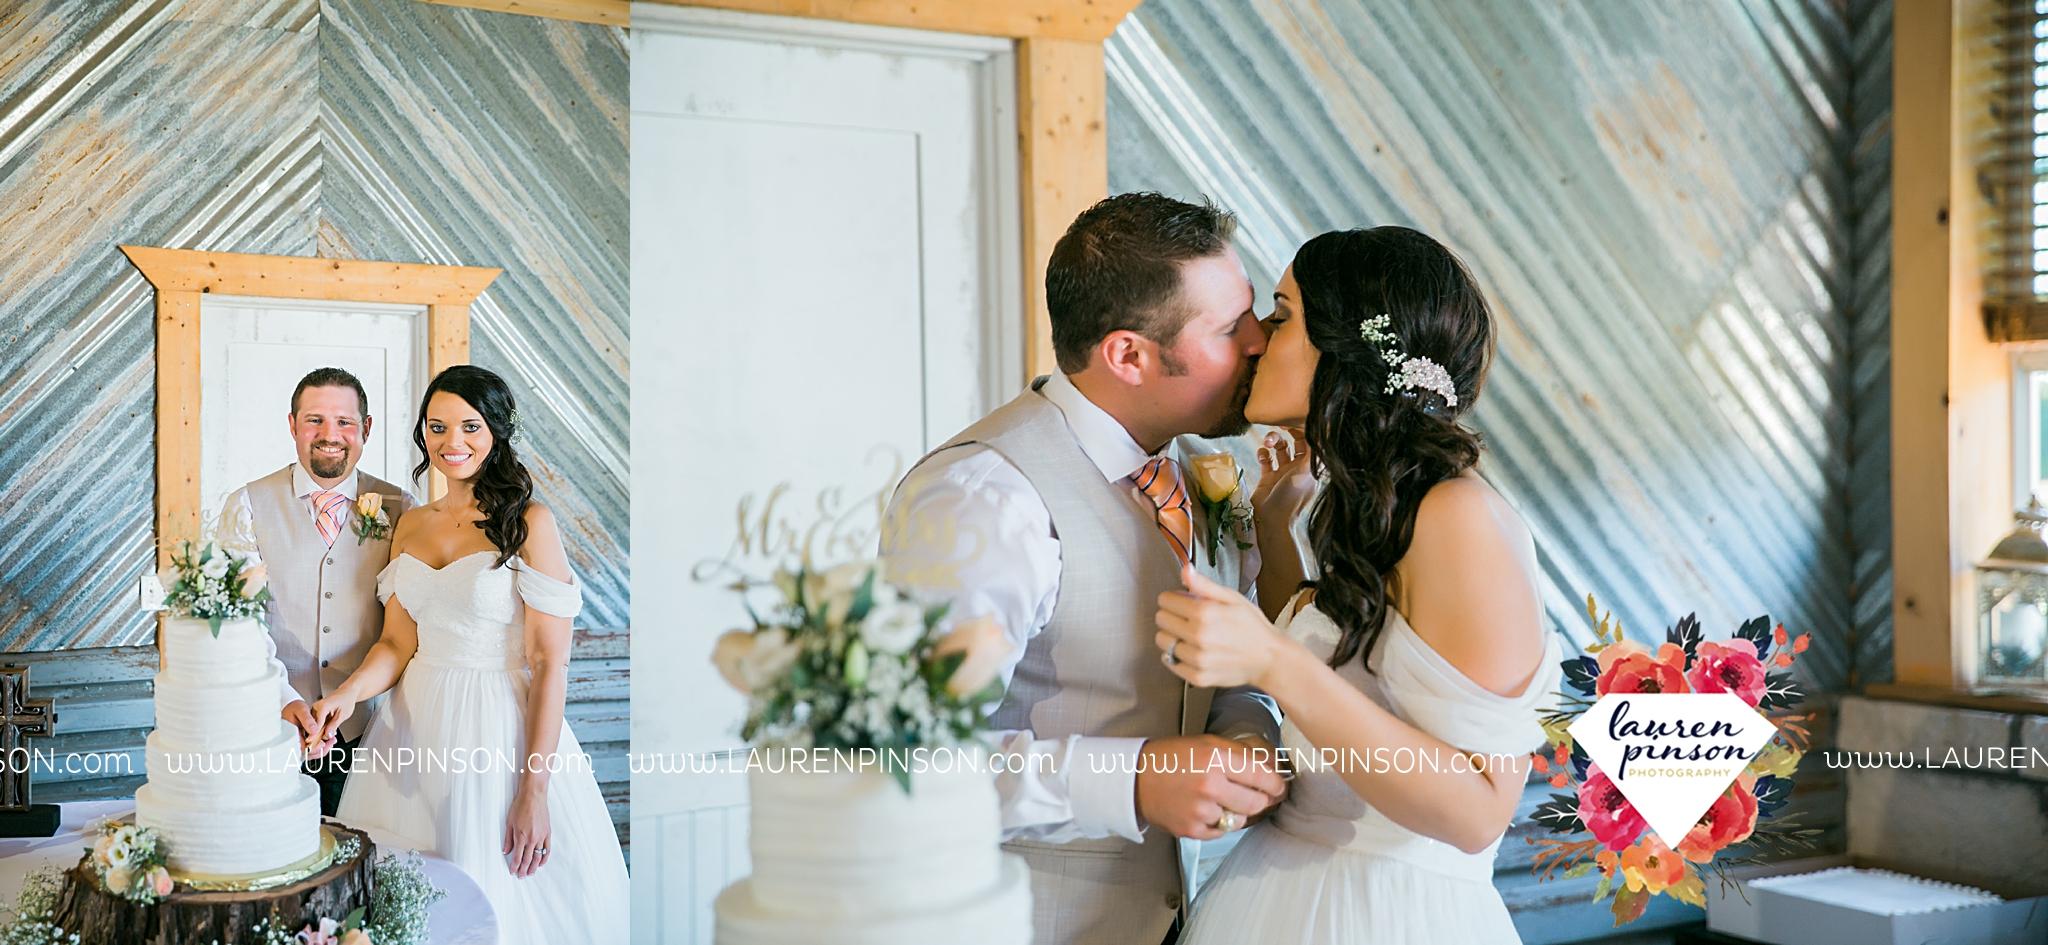 jones-barn-willow-creek-ranch-wedding-in-cleburne-texas-fort-worth-dfw-wichita-falls-wedding-photography_3259.jpg